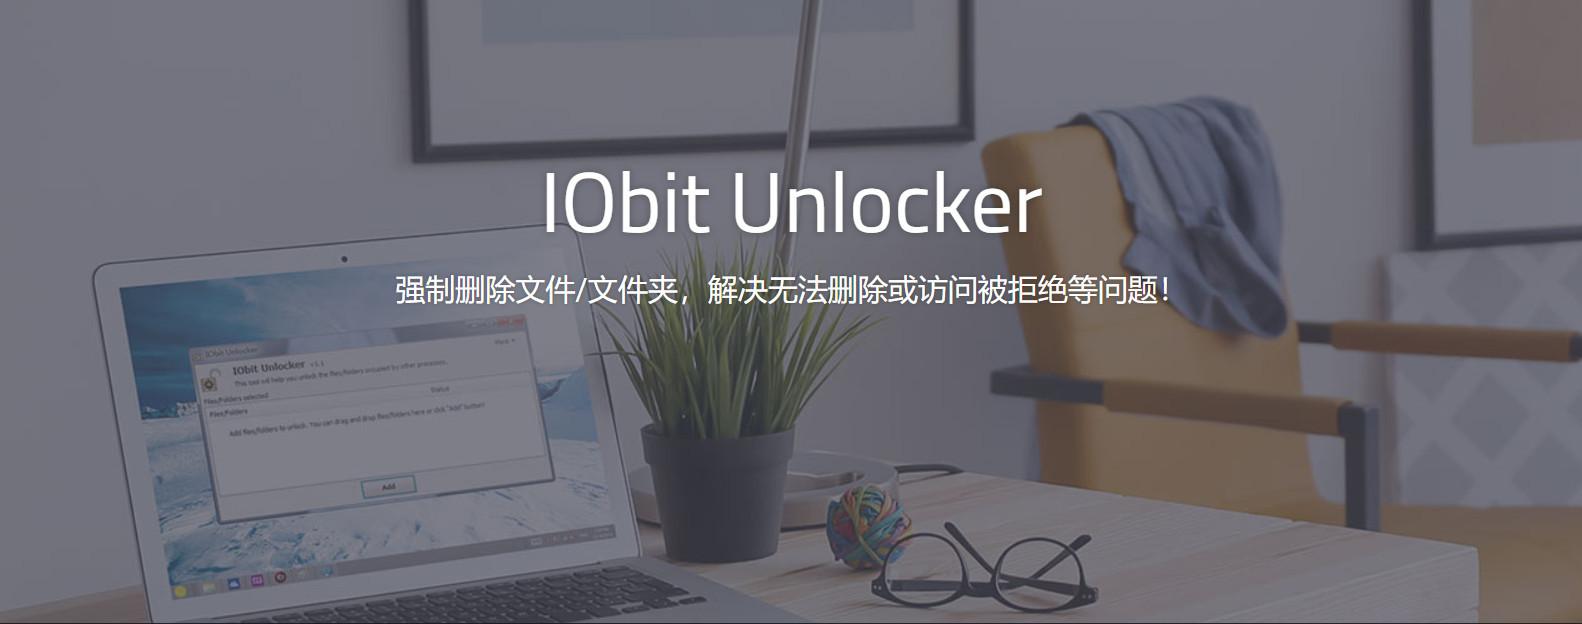 IObit Unlocker 1.1.2 强制删除文件/文件夹工具